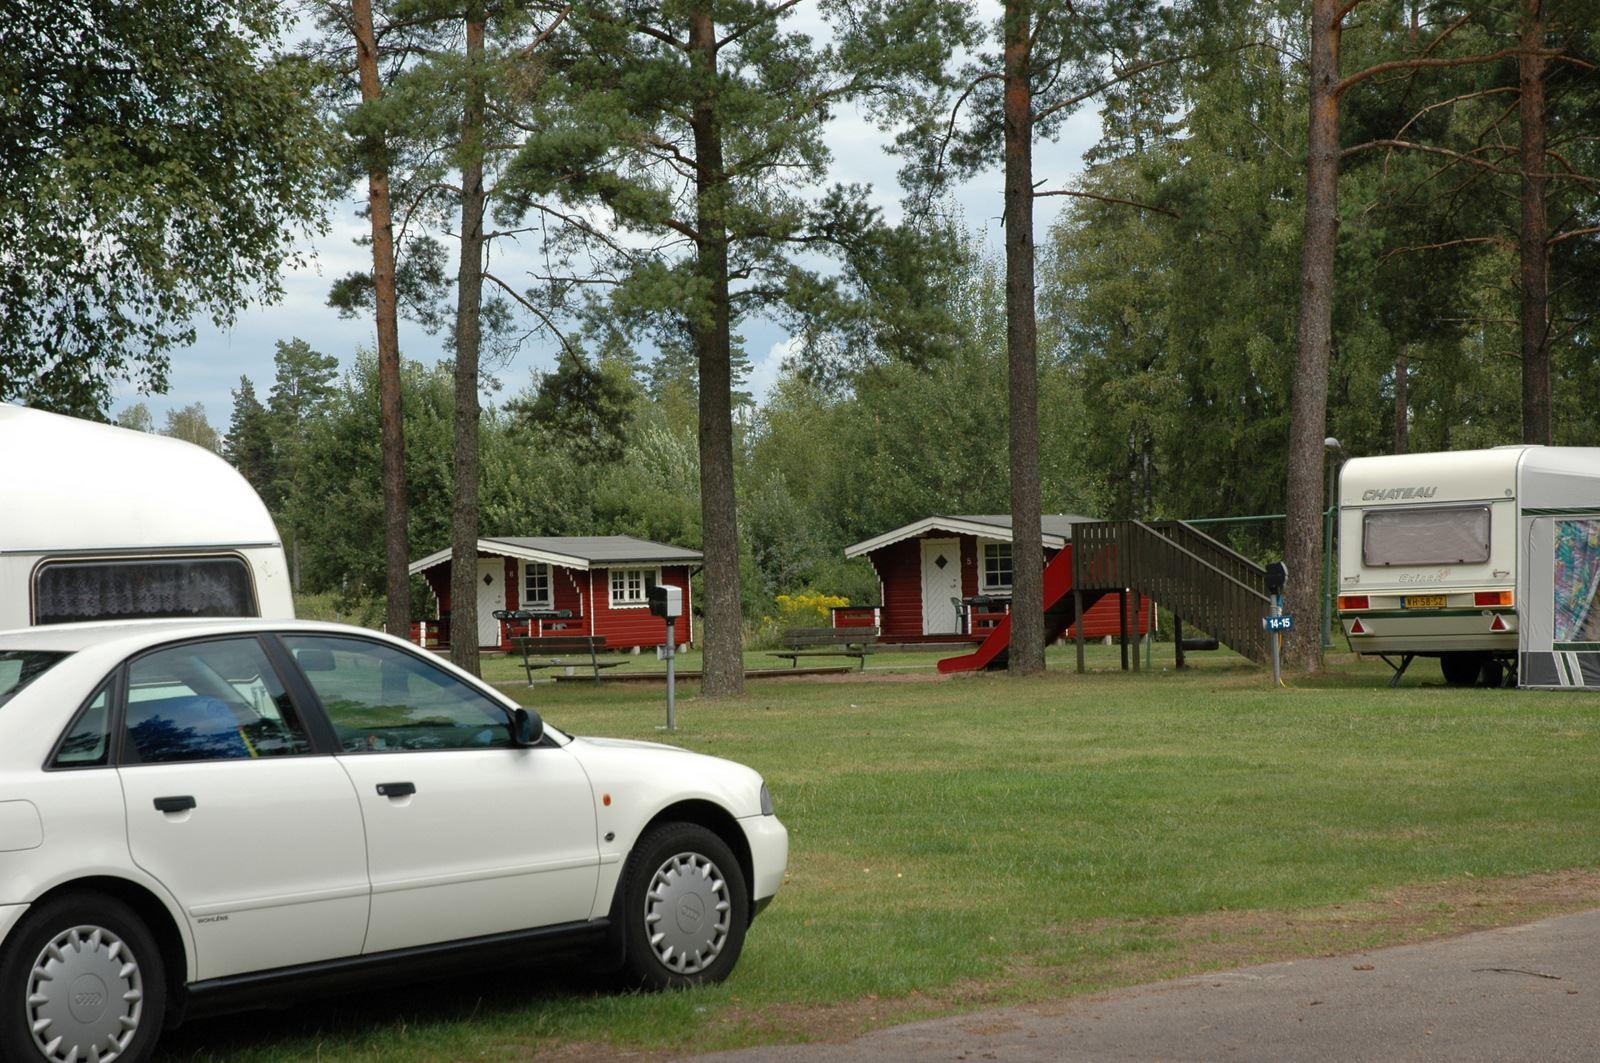 Gislaveds kommun,  © Gislaveds kommun, Hörsjöns camping